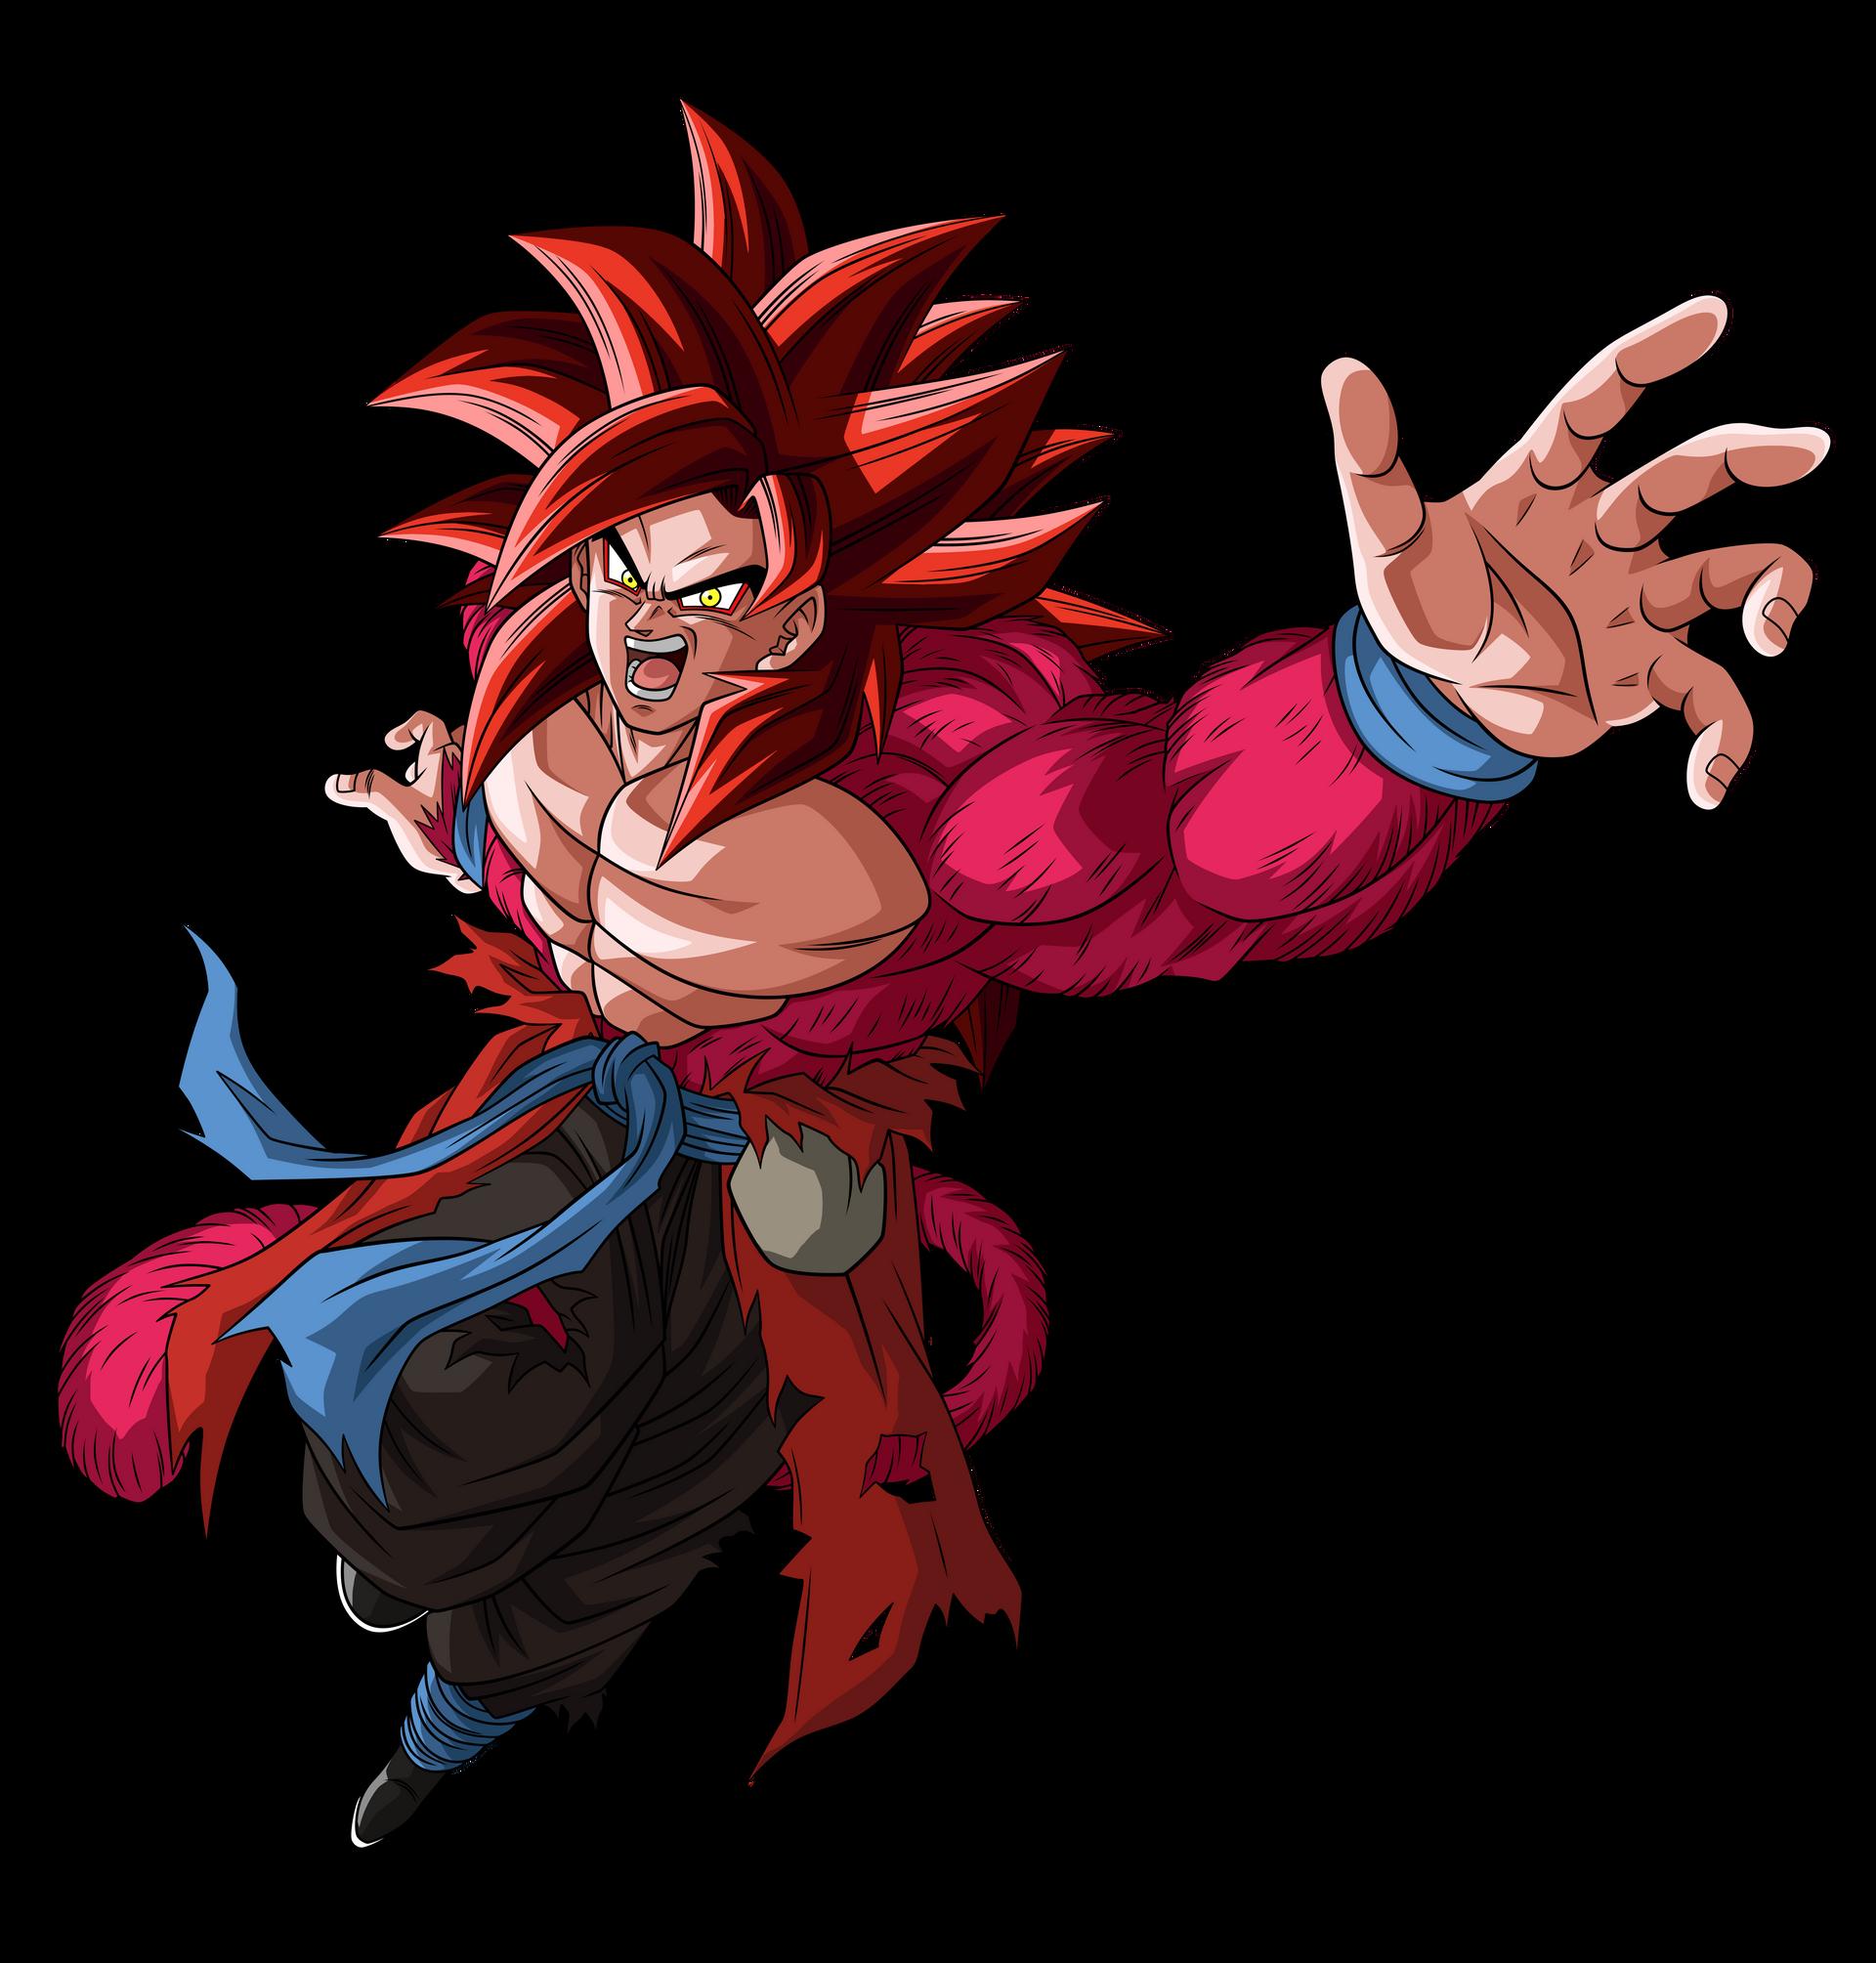 Goku Ssj4 Limit Breaker Render 1 By Ssjrose890 On Deviantart Dragon Ball Artwork Anime Dragon Ball Super Dragon Ball Art